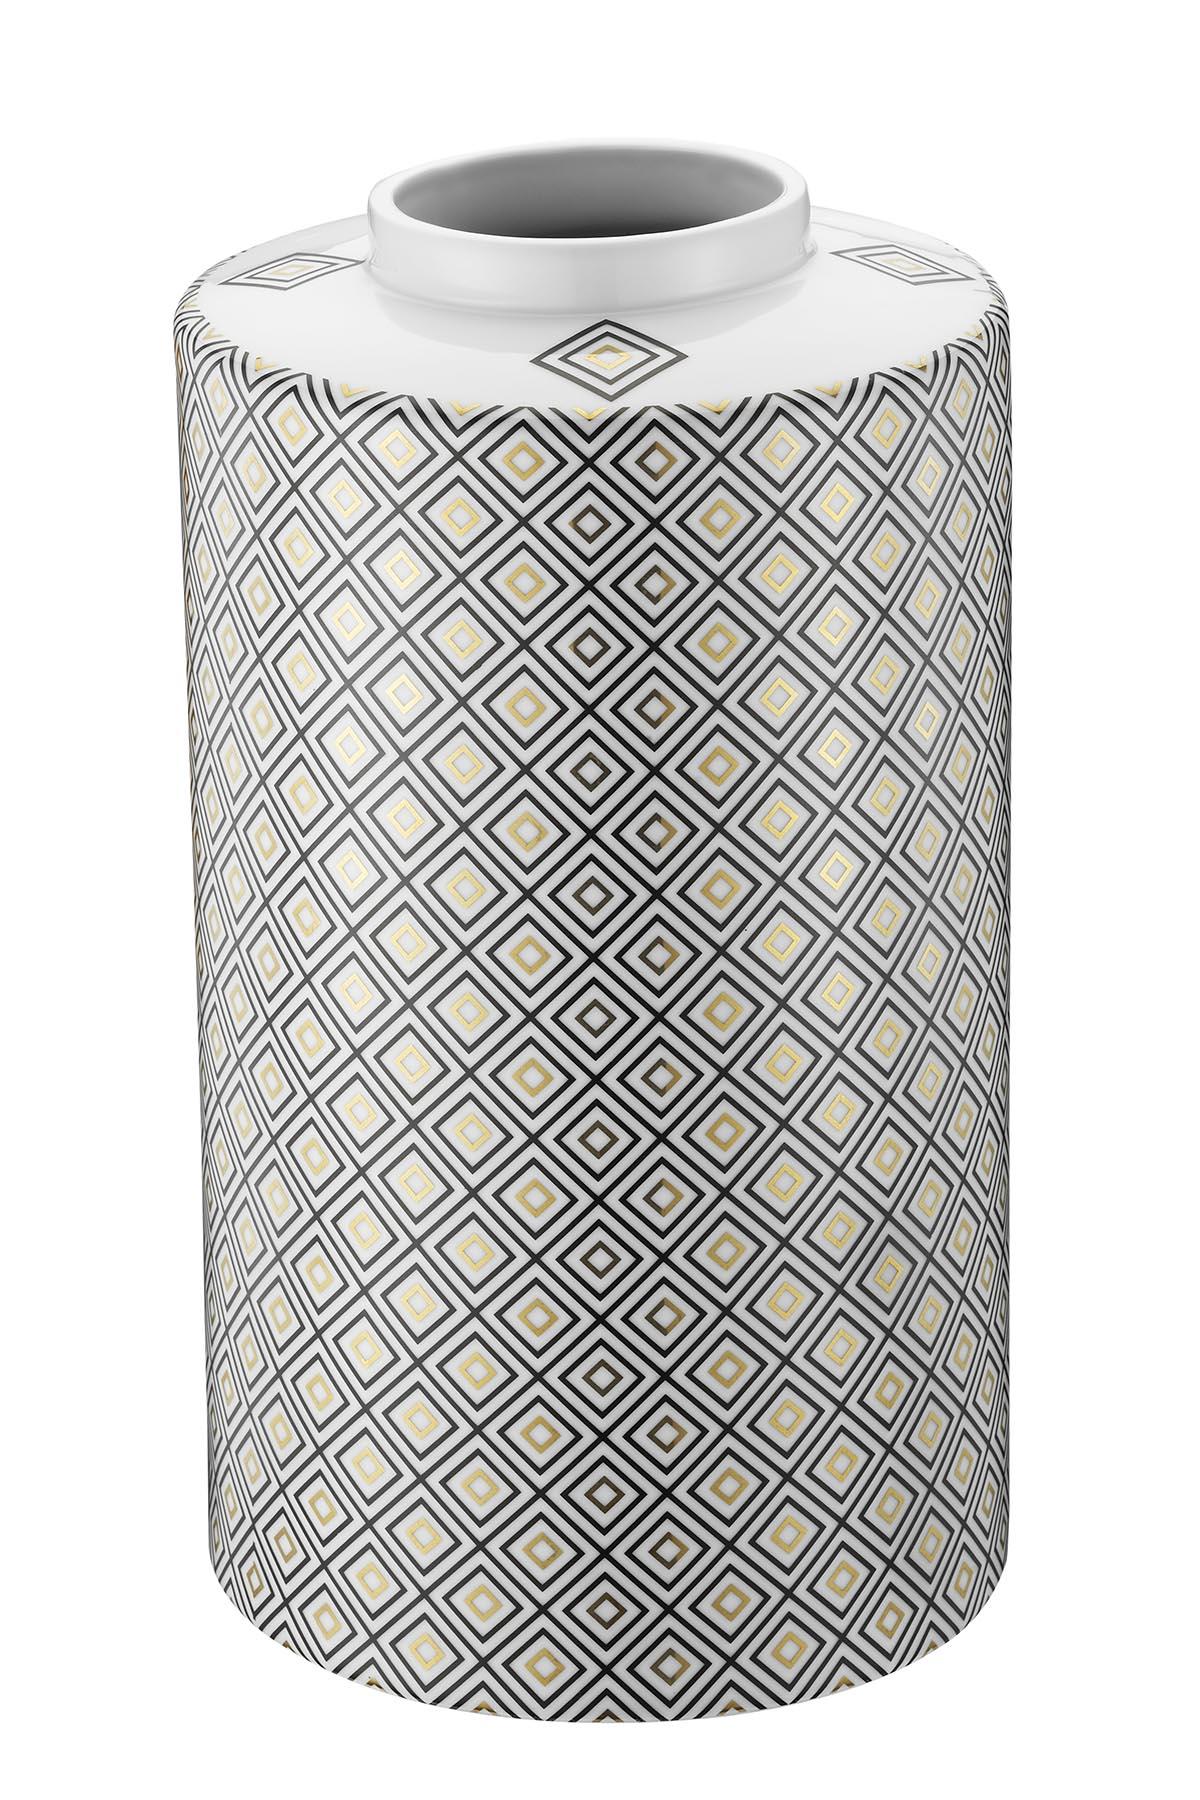 Kütahya Porselen Modern 35 cm Kapaklı Vazo 10917